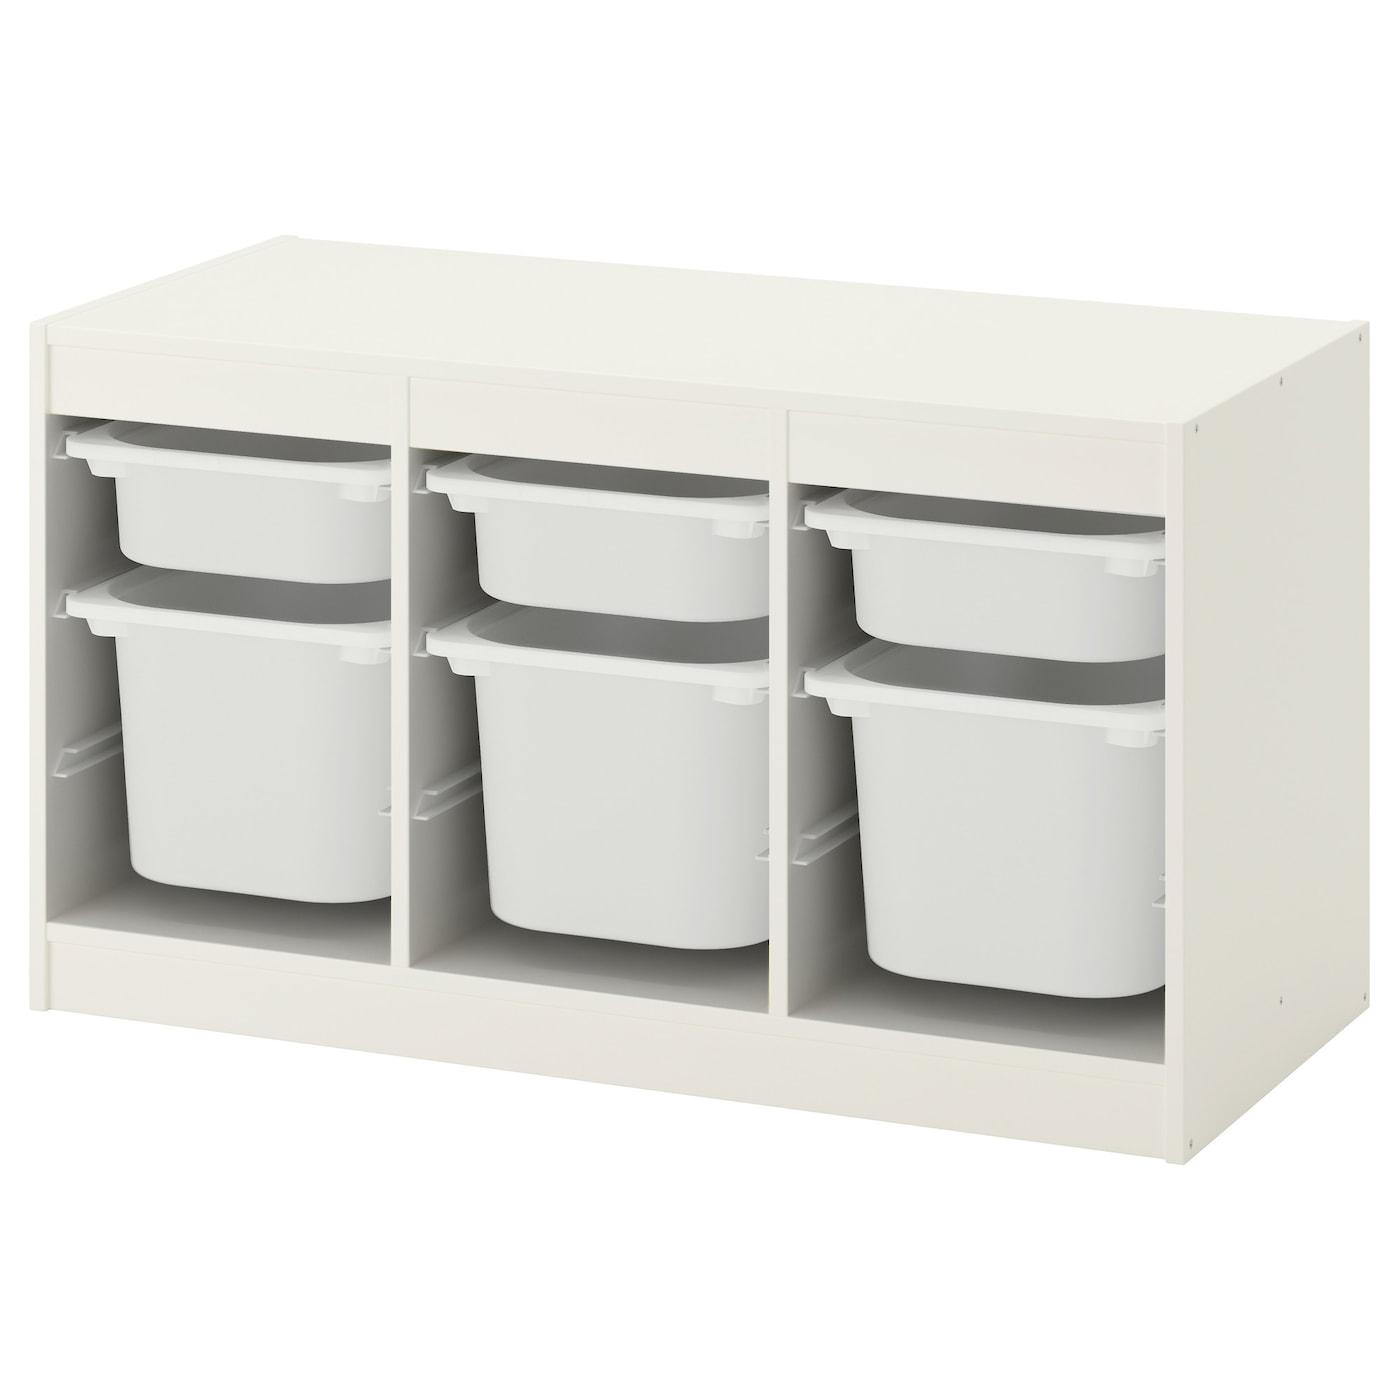 TROFAST Storage Combination With Boxes White White